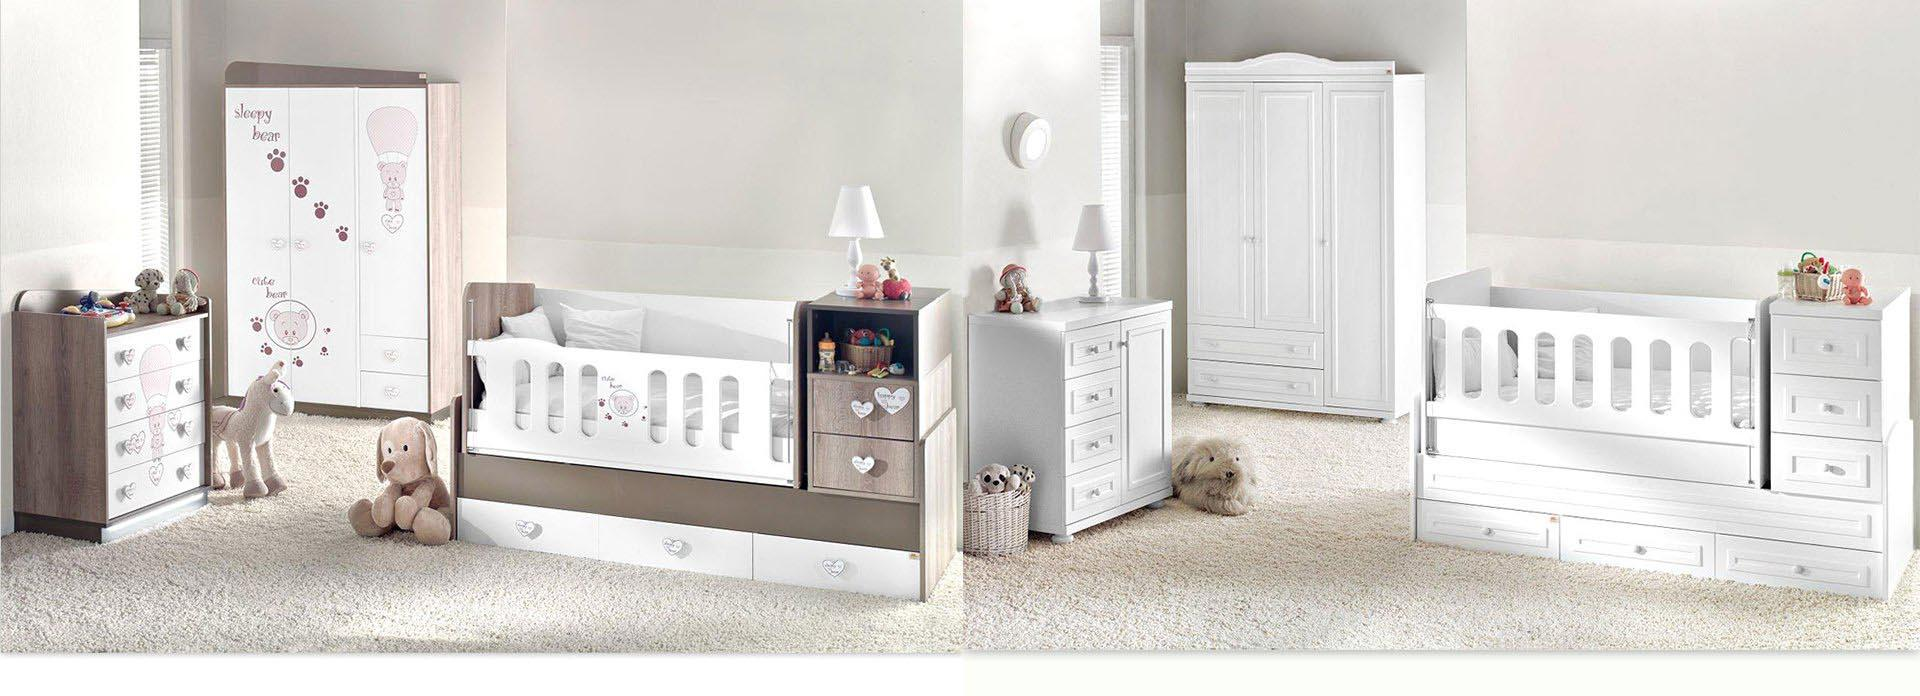 babyzimmer komplett weiss babyzimmer komplett bonheur wei lein babyzimmer komplett bonheur wei. Black Bedroom Furniture Sets. Home Design Ideas